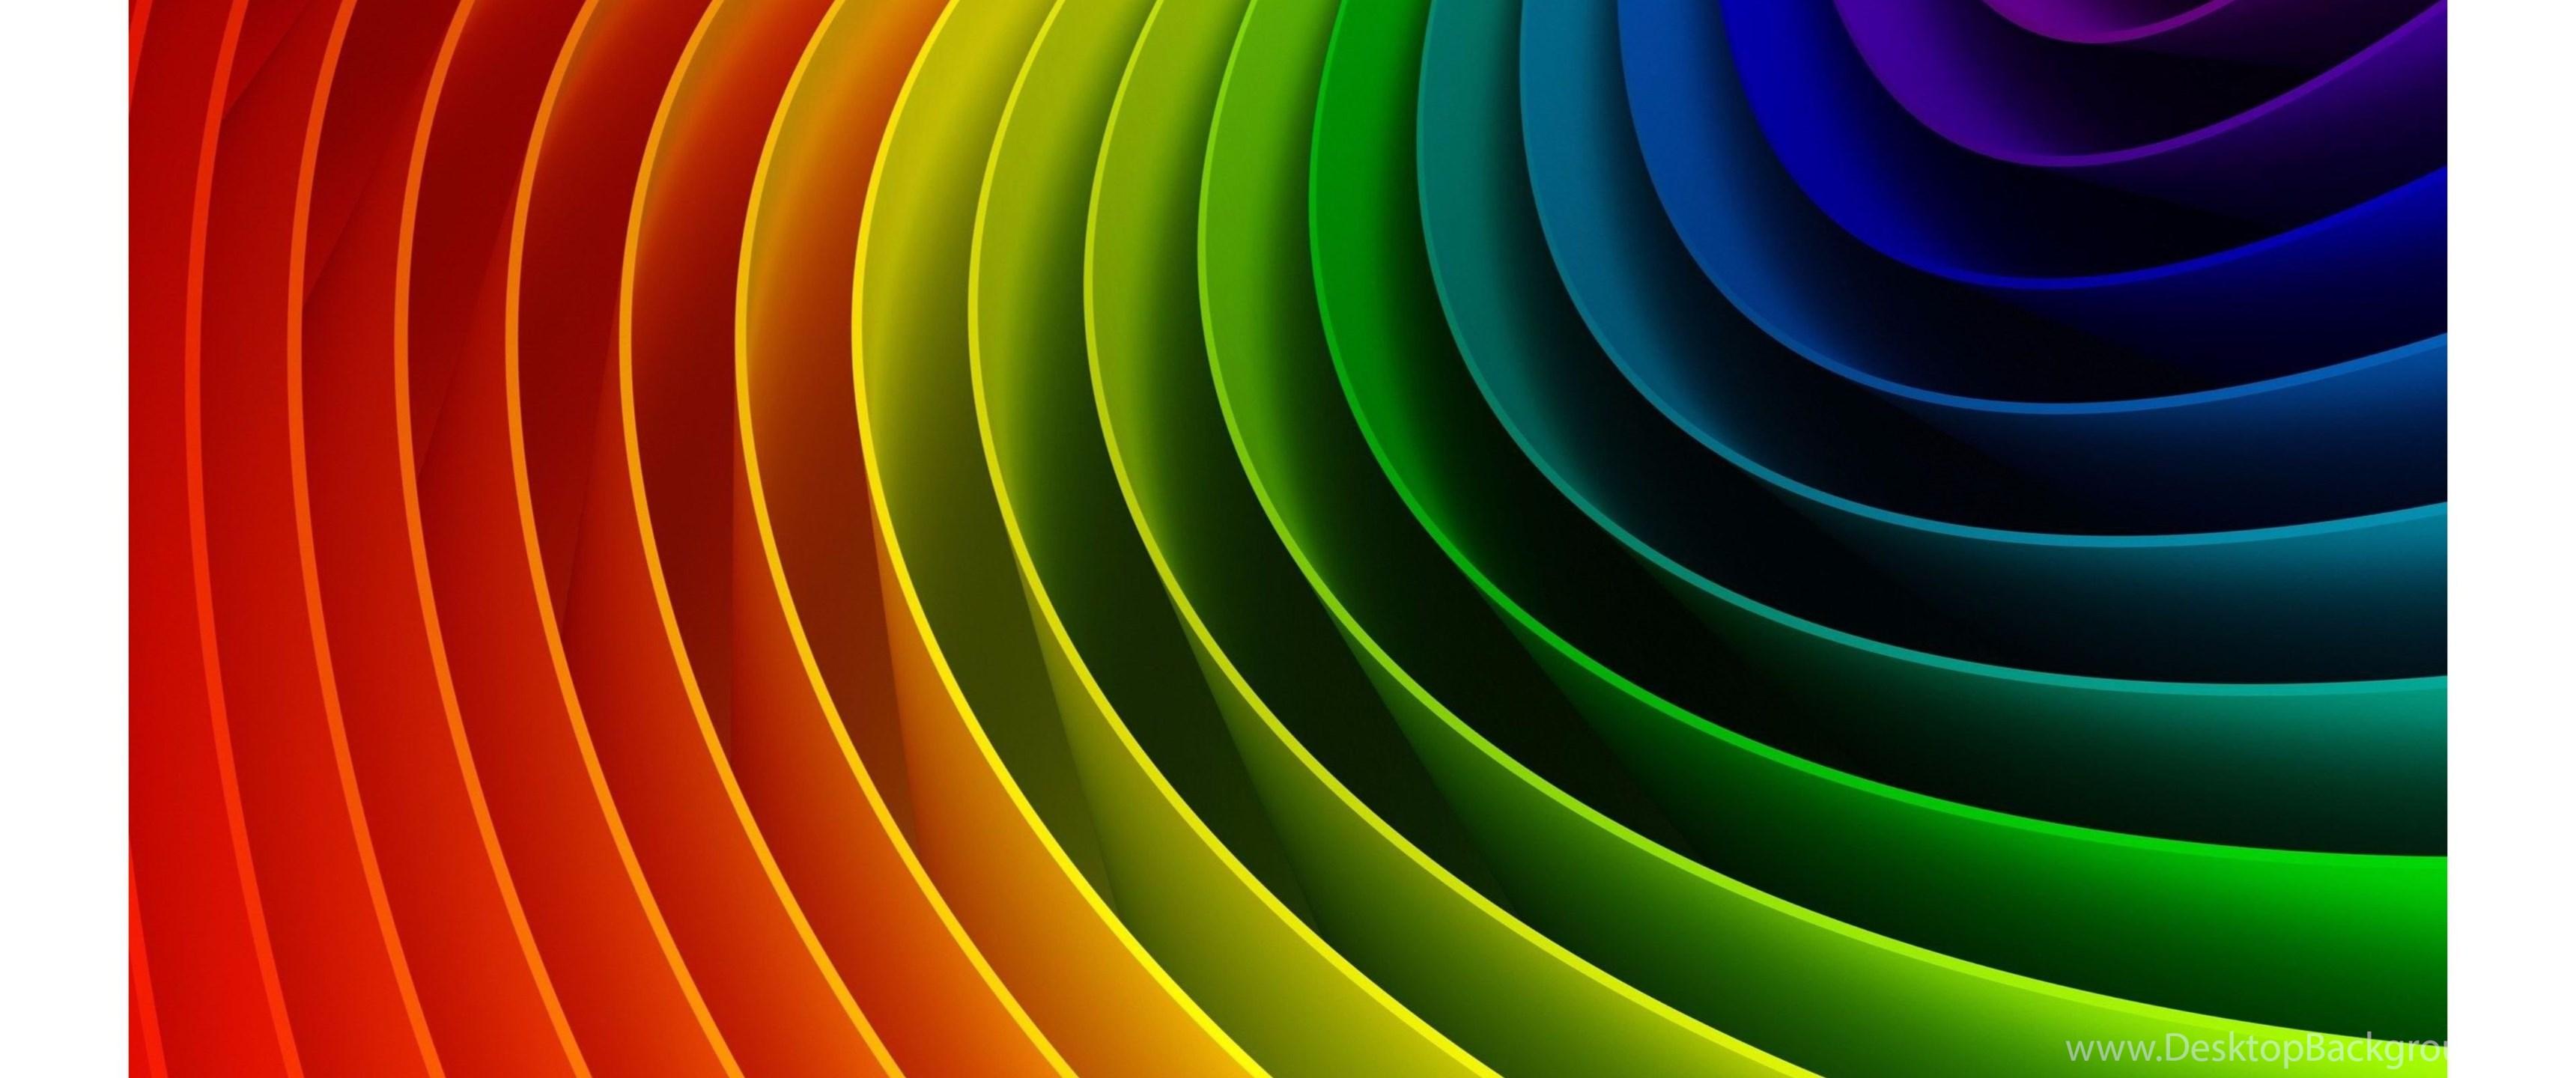 Color Wheel 4K Abstract Wallpapers Desktop Background